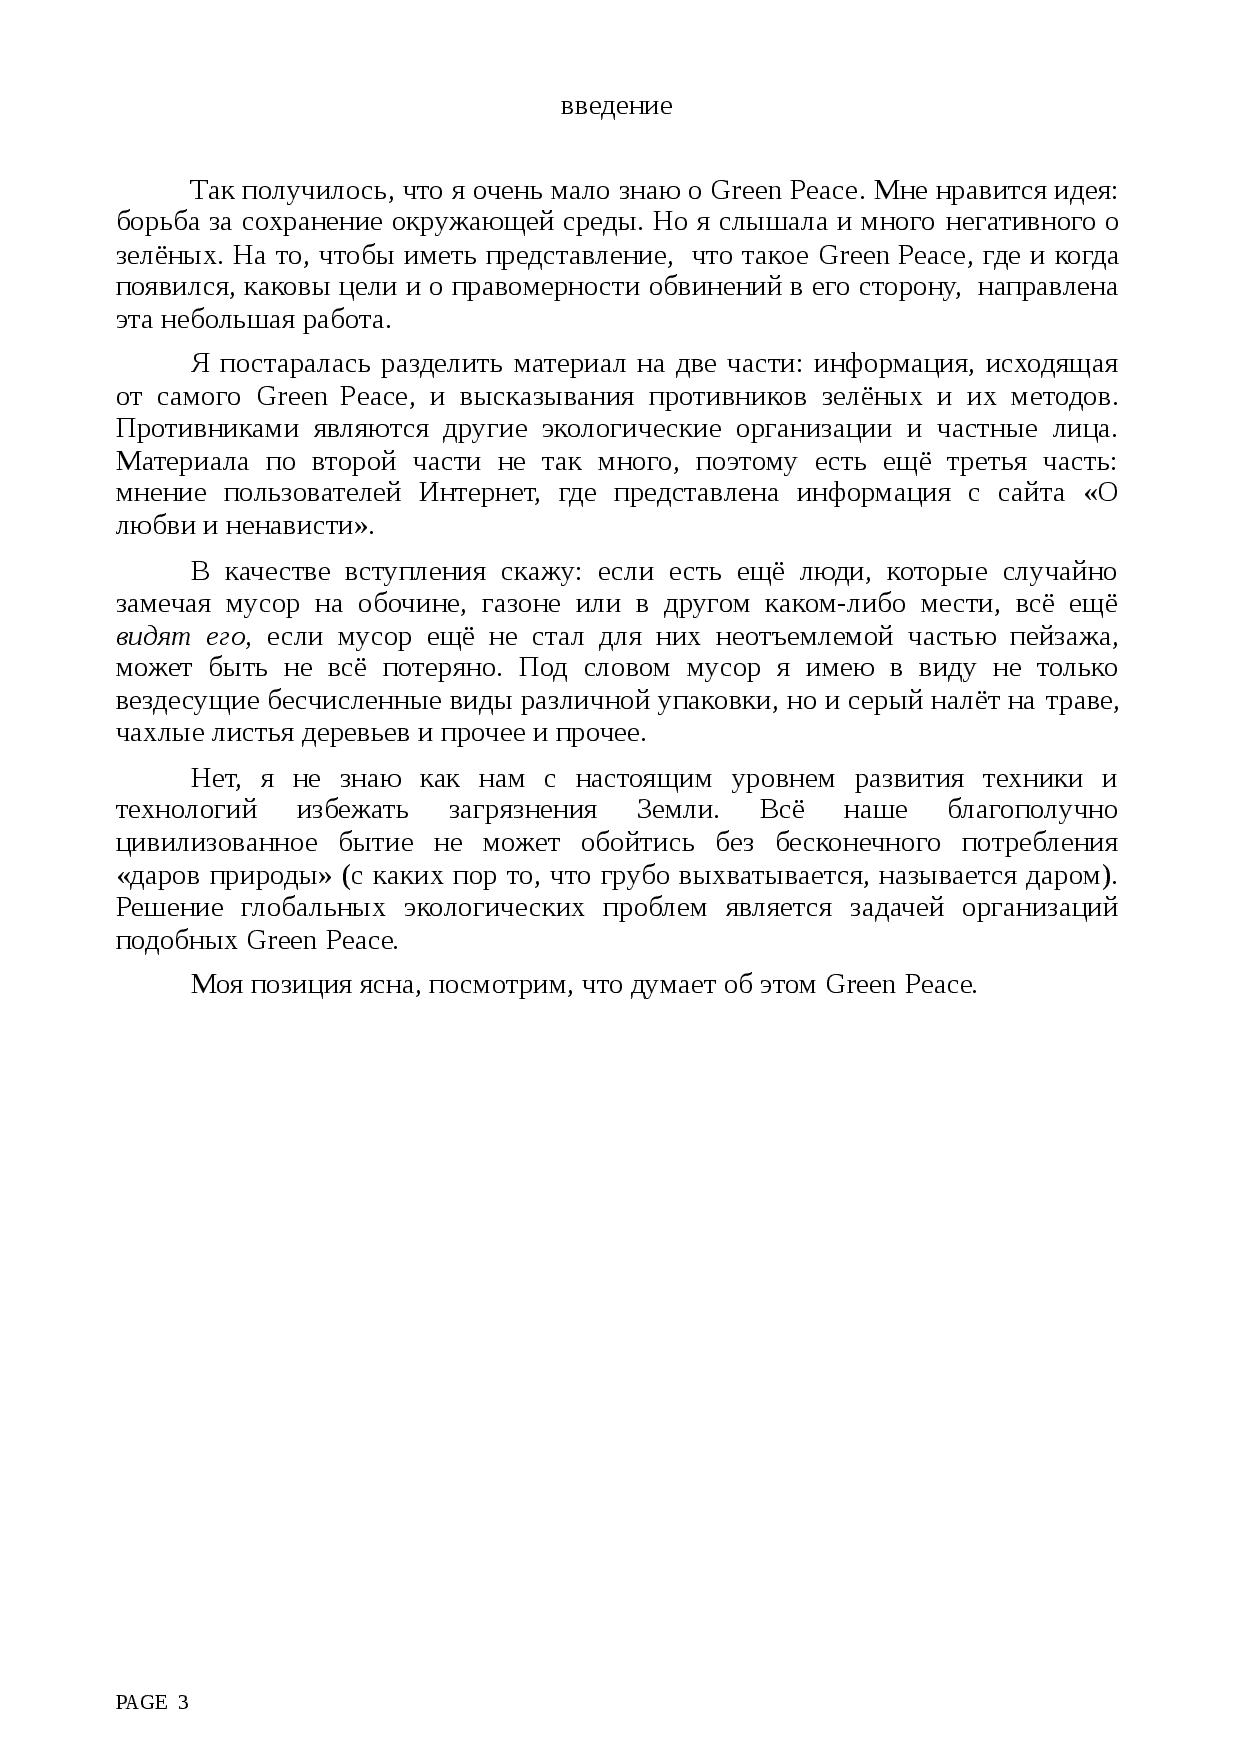 гринпис цели и задачи